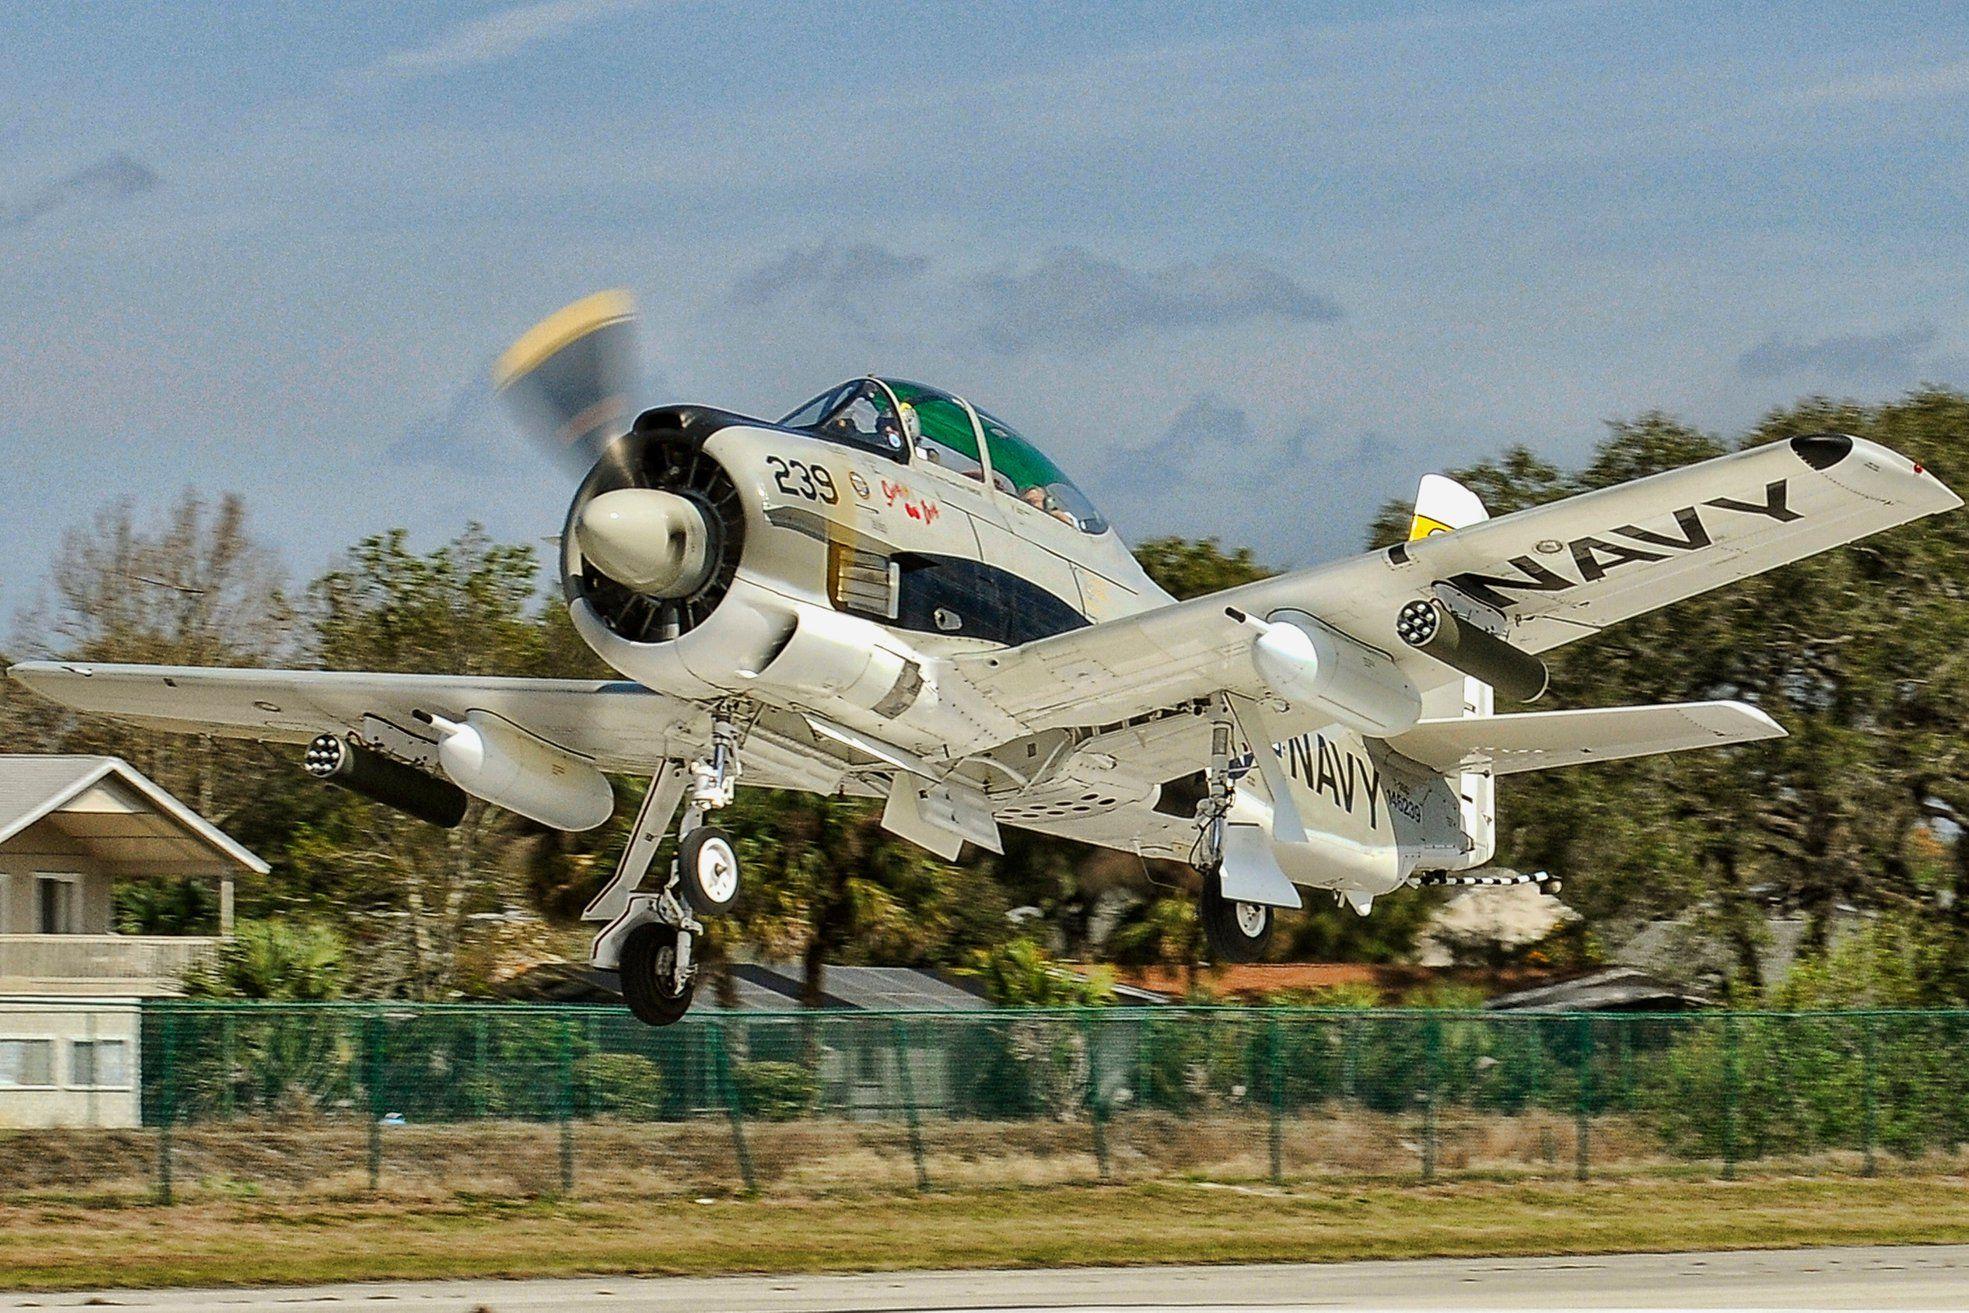 Pin on Vintage Aircraft Survivors & Replicas